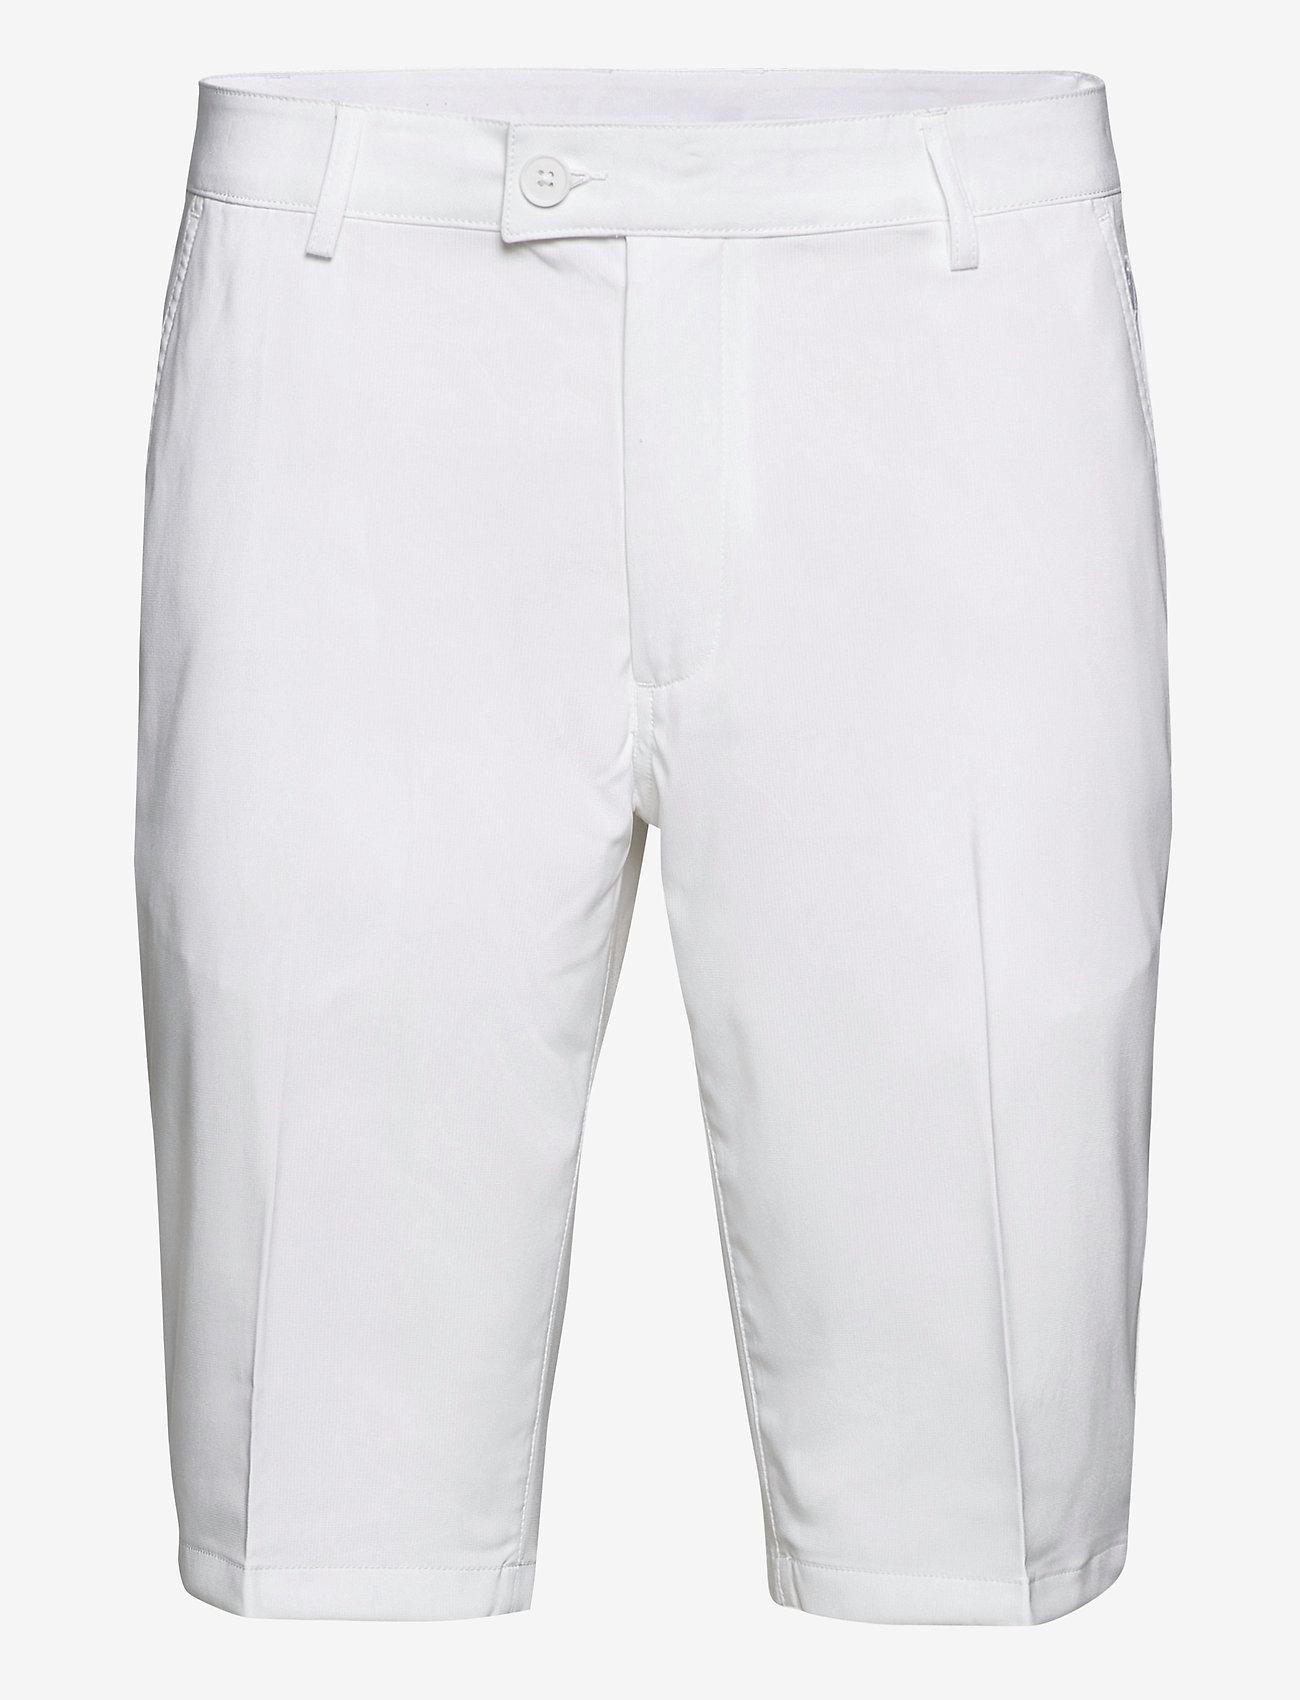 Abacus - Mens Cleek stretch shorts - golfbroeken - white - 0